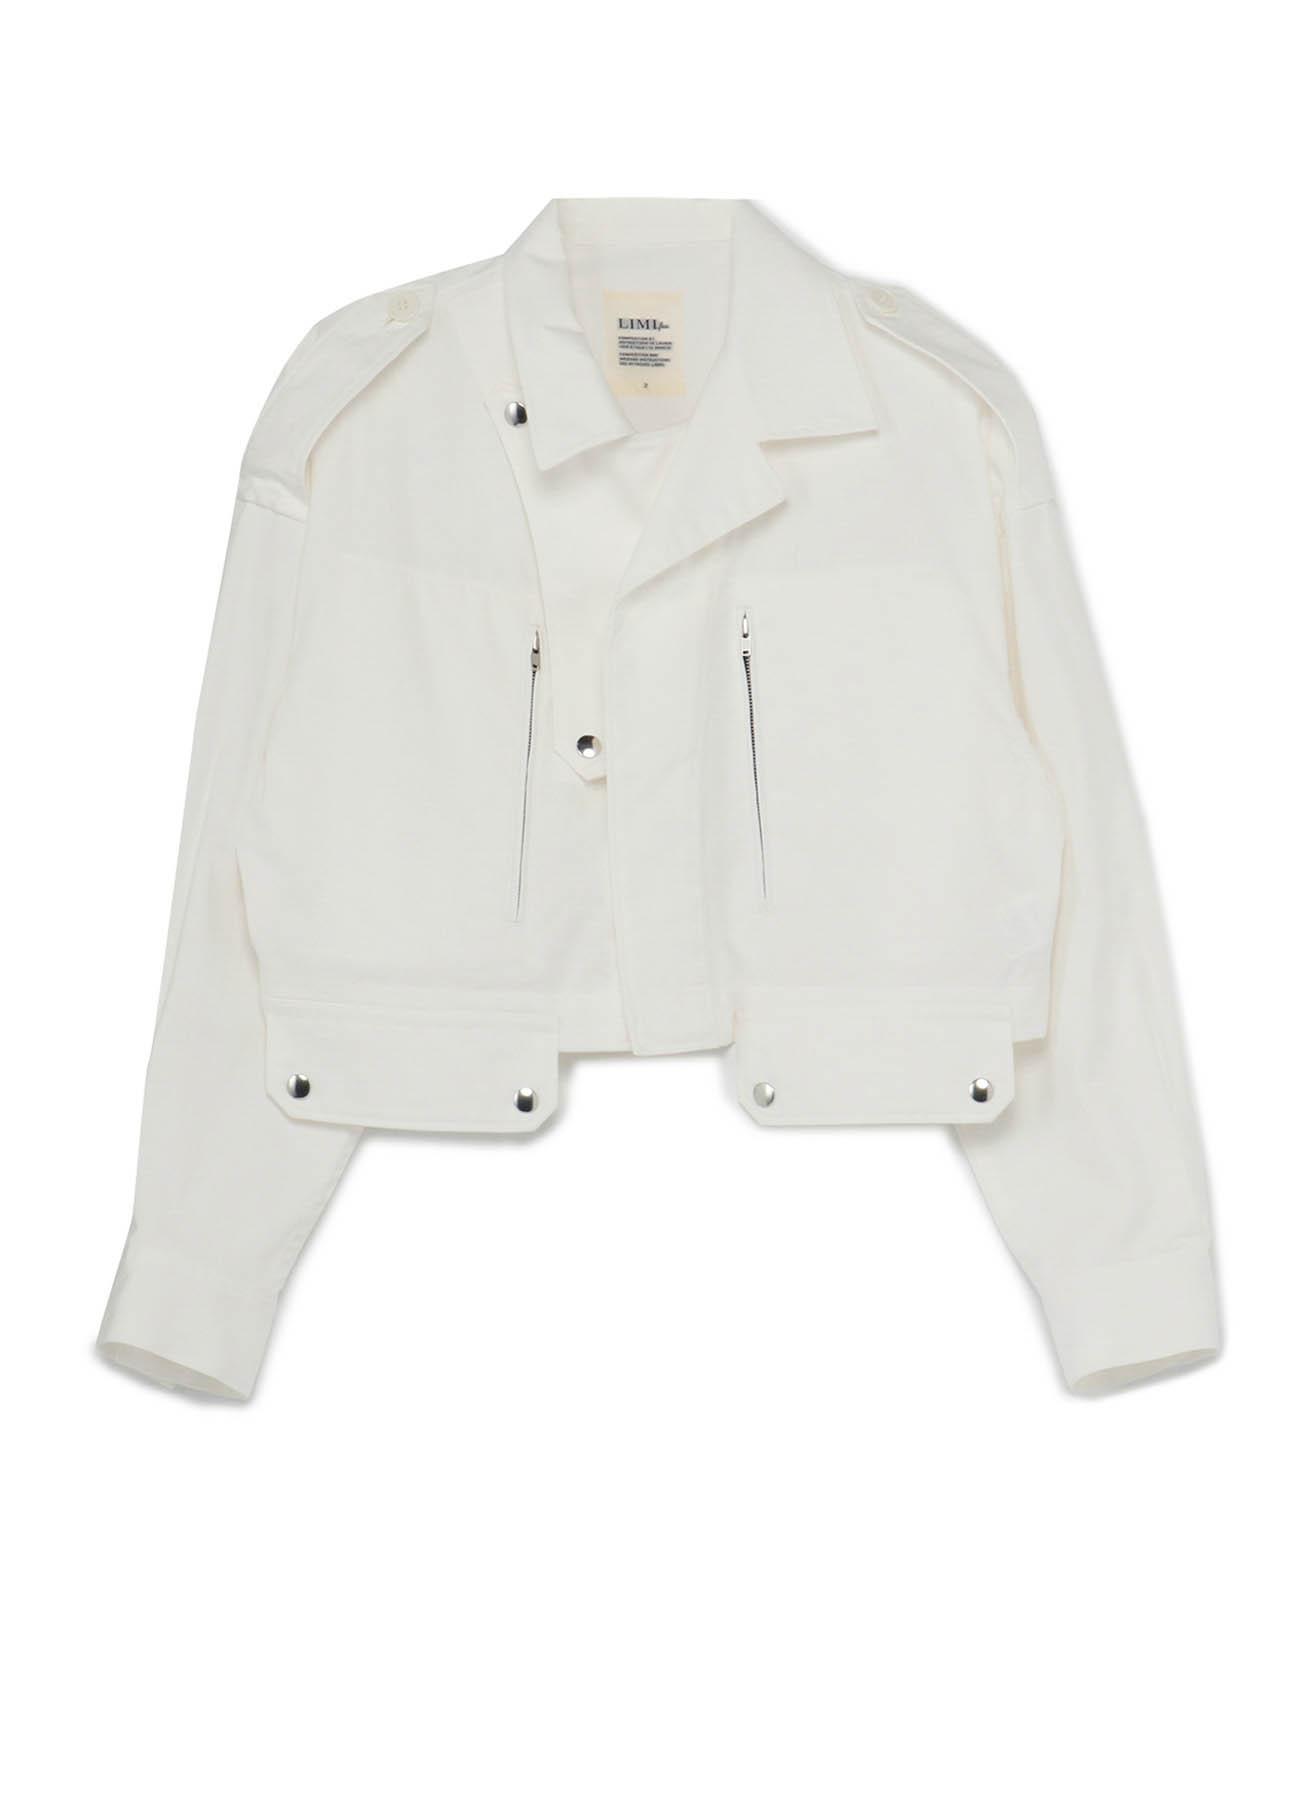 16/- Twill Military Short Jacket